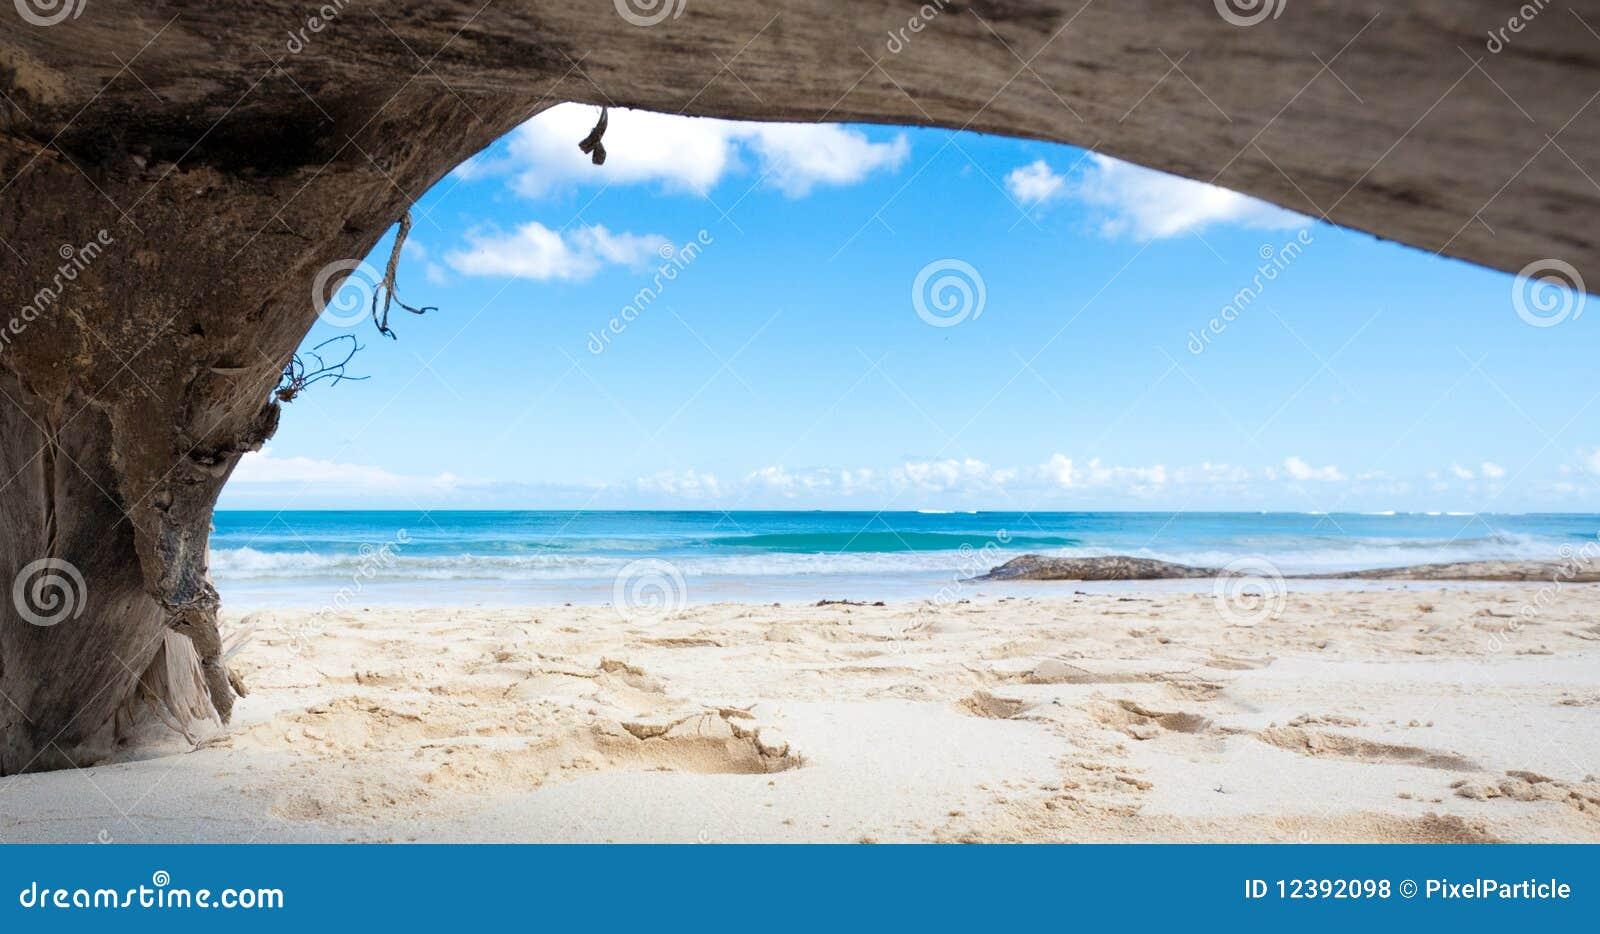 natural framed tropical beach